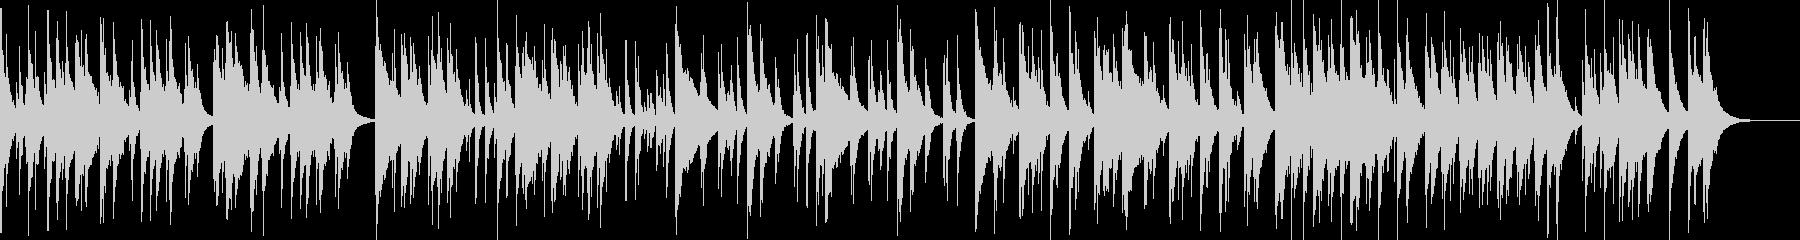 日本伝統音楽6(和太鼓)の未再生の波形